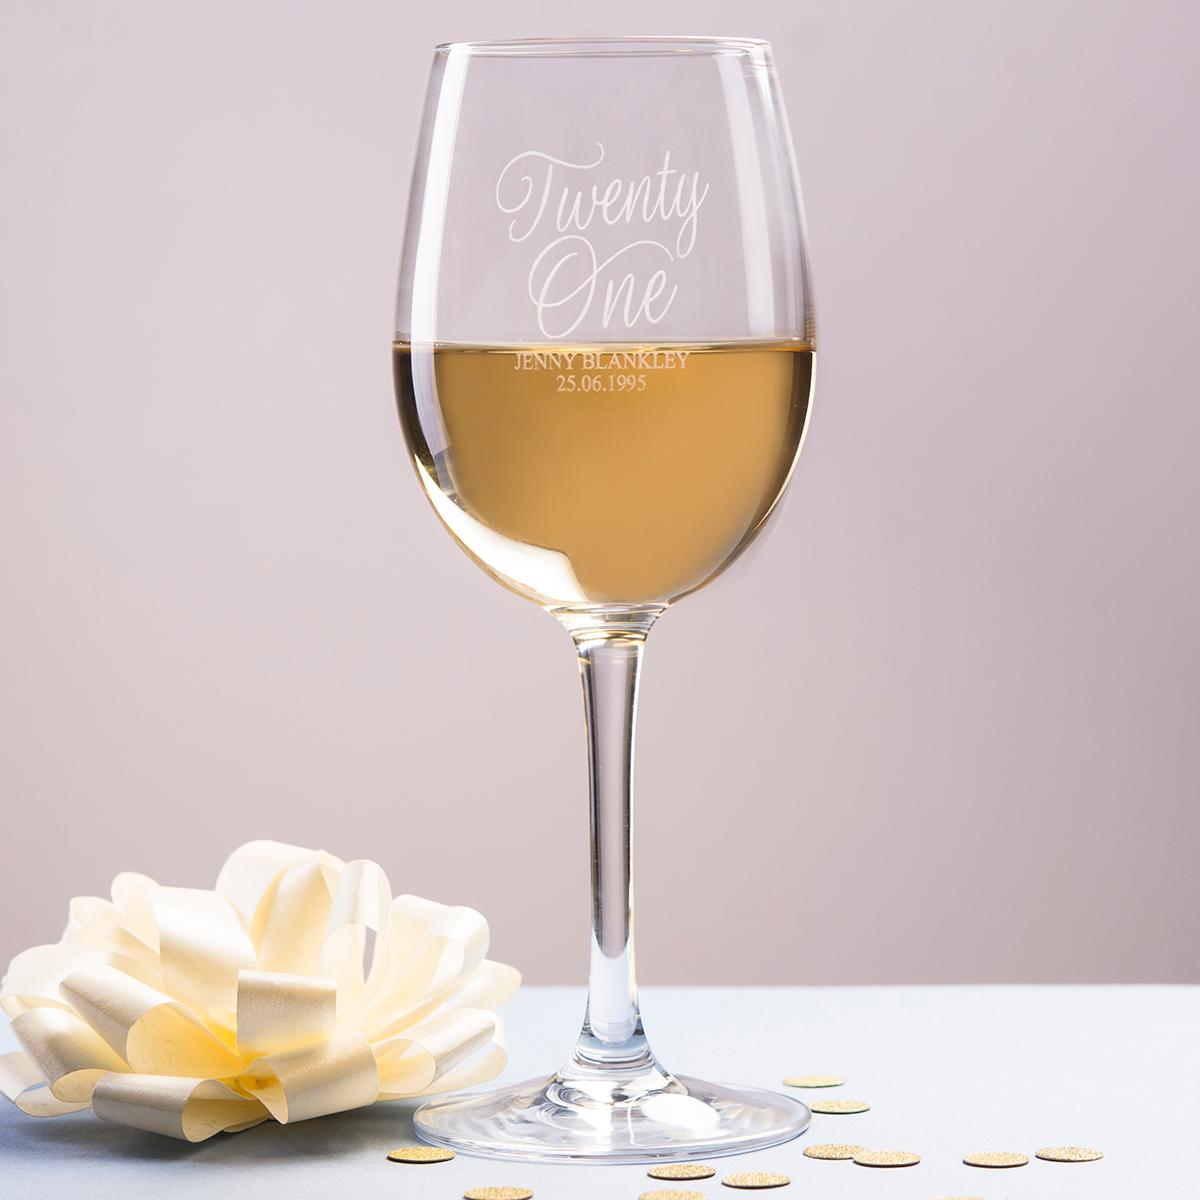 Personalised Wine Glass - Twenty One - 21st gift